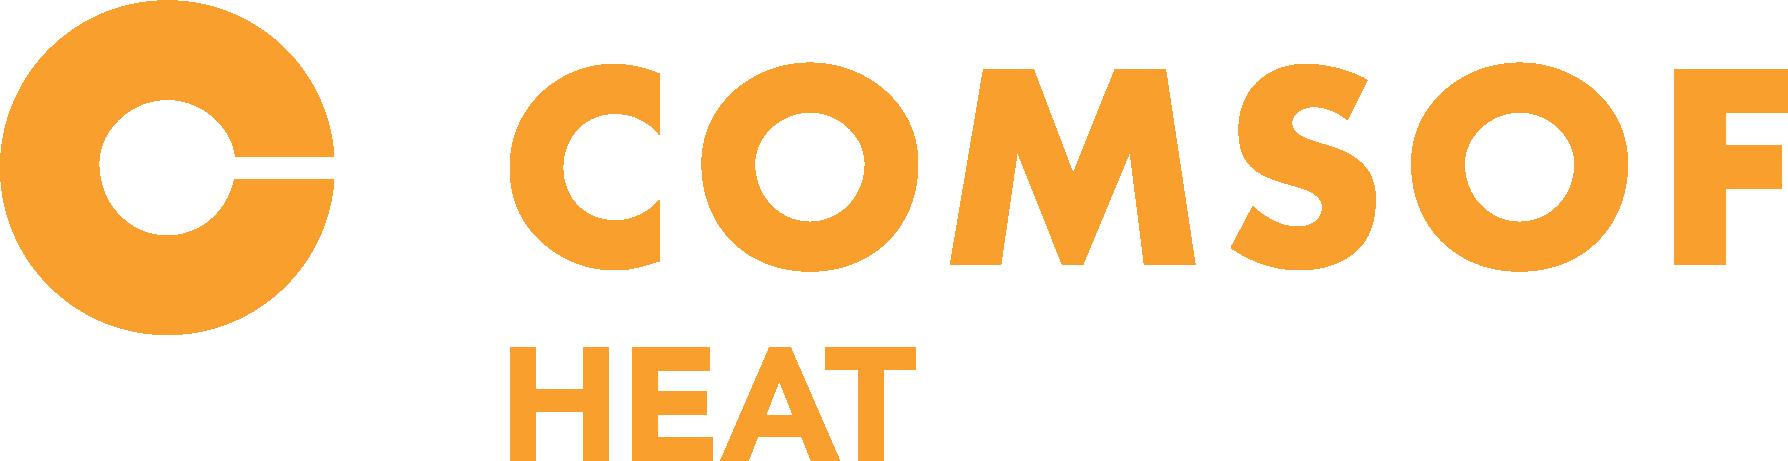 Comsof Heat